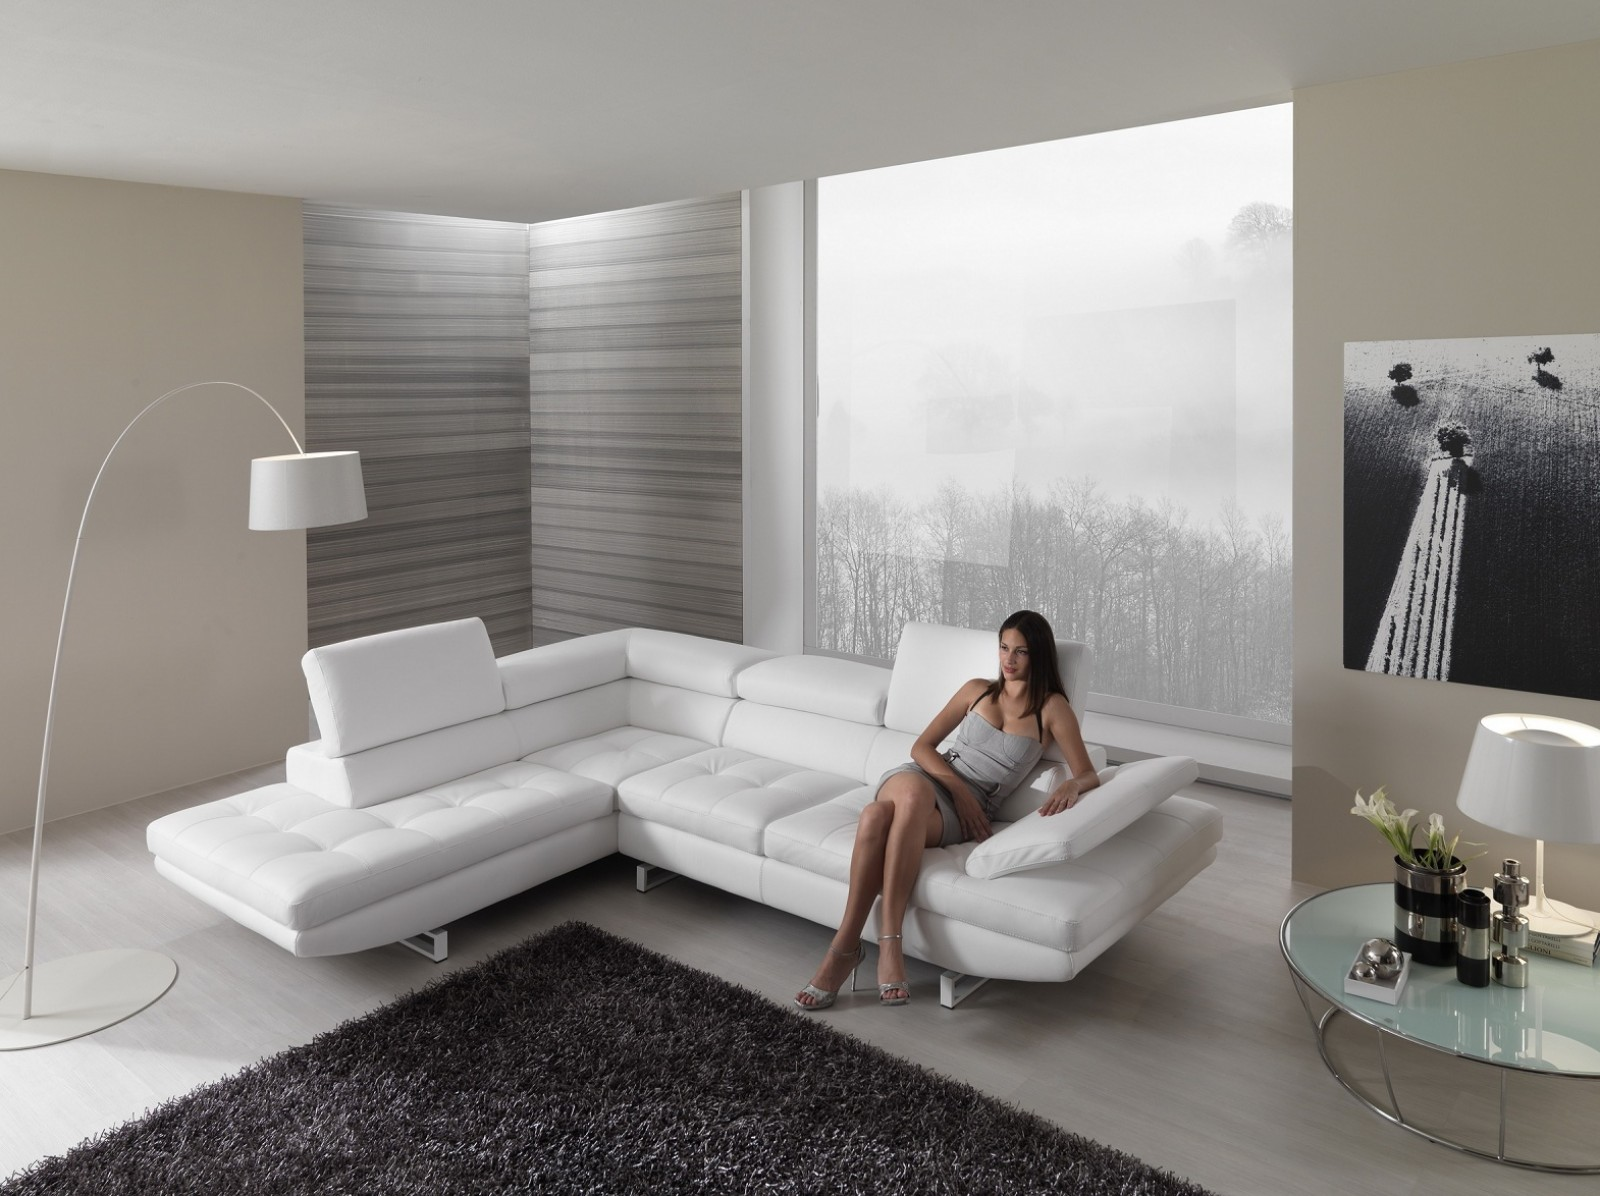 Proposte d 39 arredo divani habart - Divano bianco in pelle ...